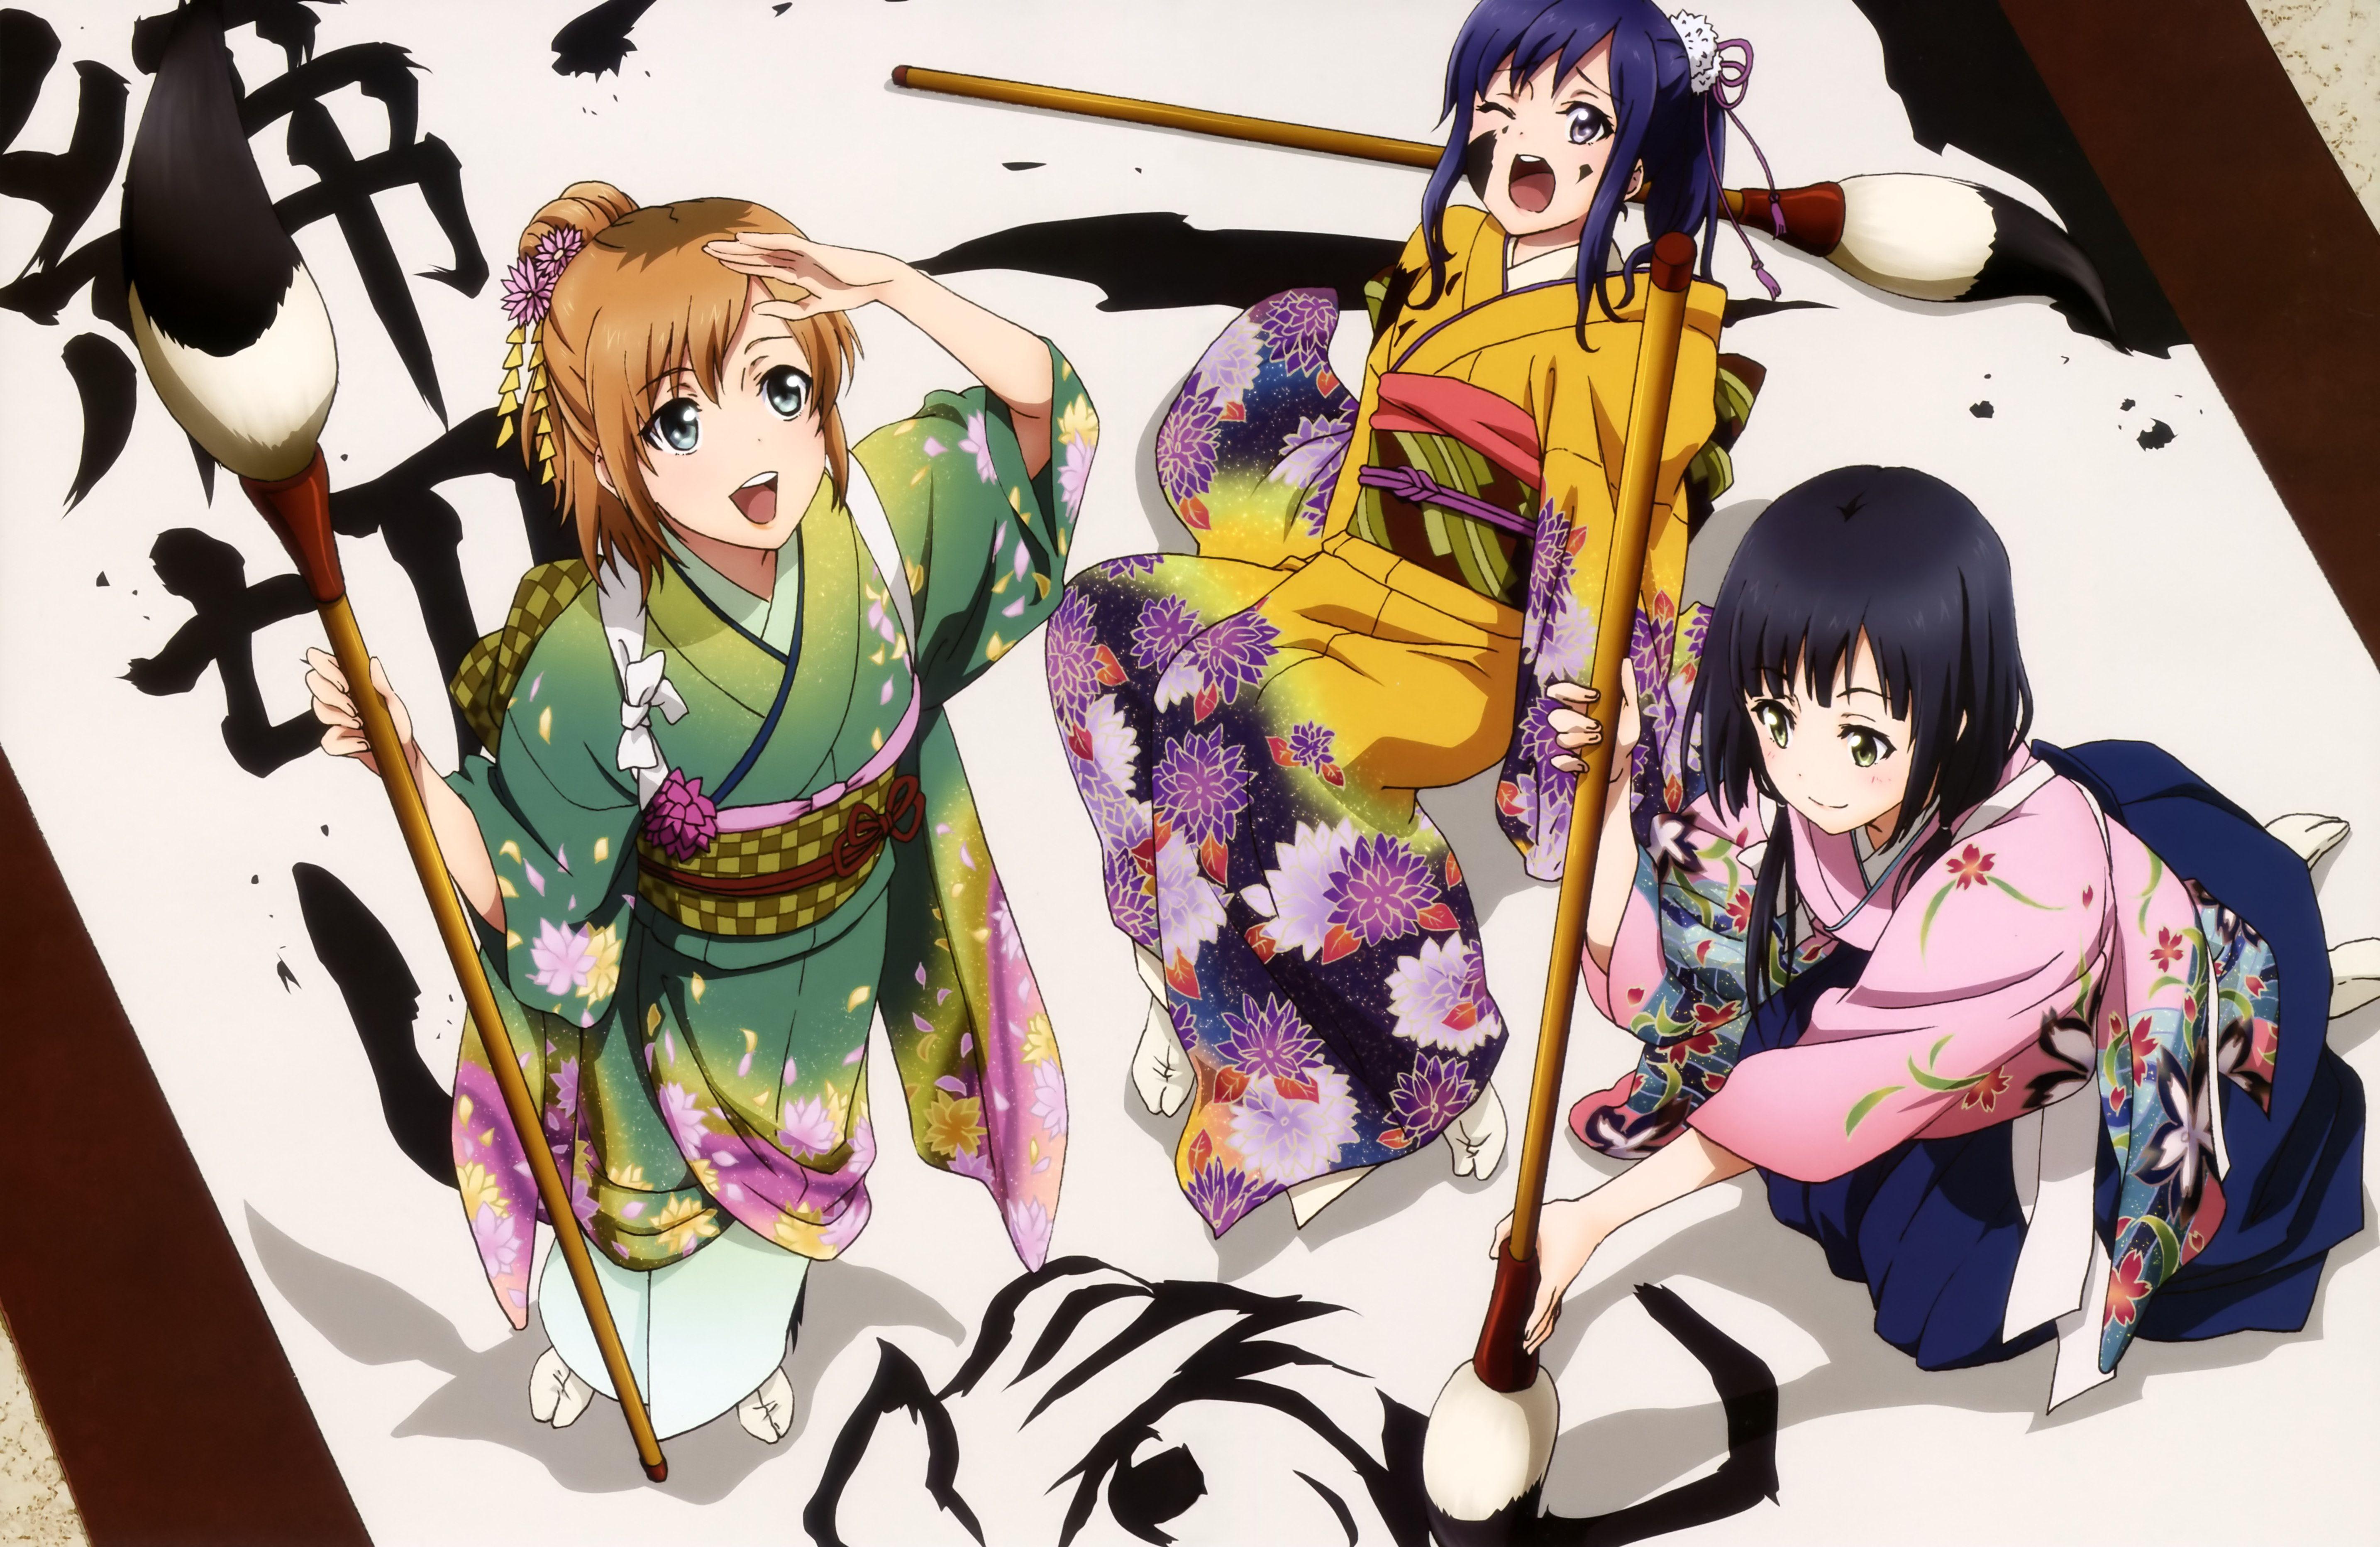 Shirobako Computer Wallpapers Desktop Backgrounds 5735x3727 Id Anime Anime Art Musashino